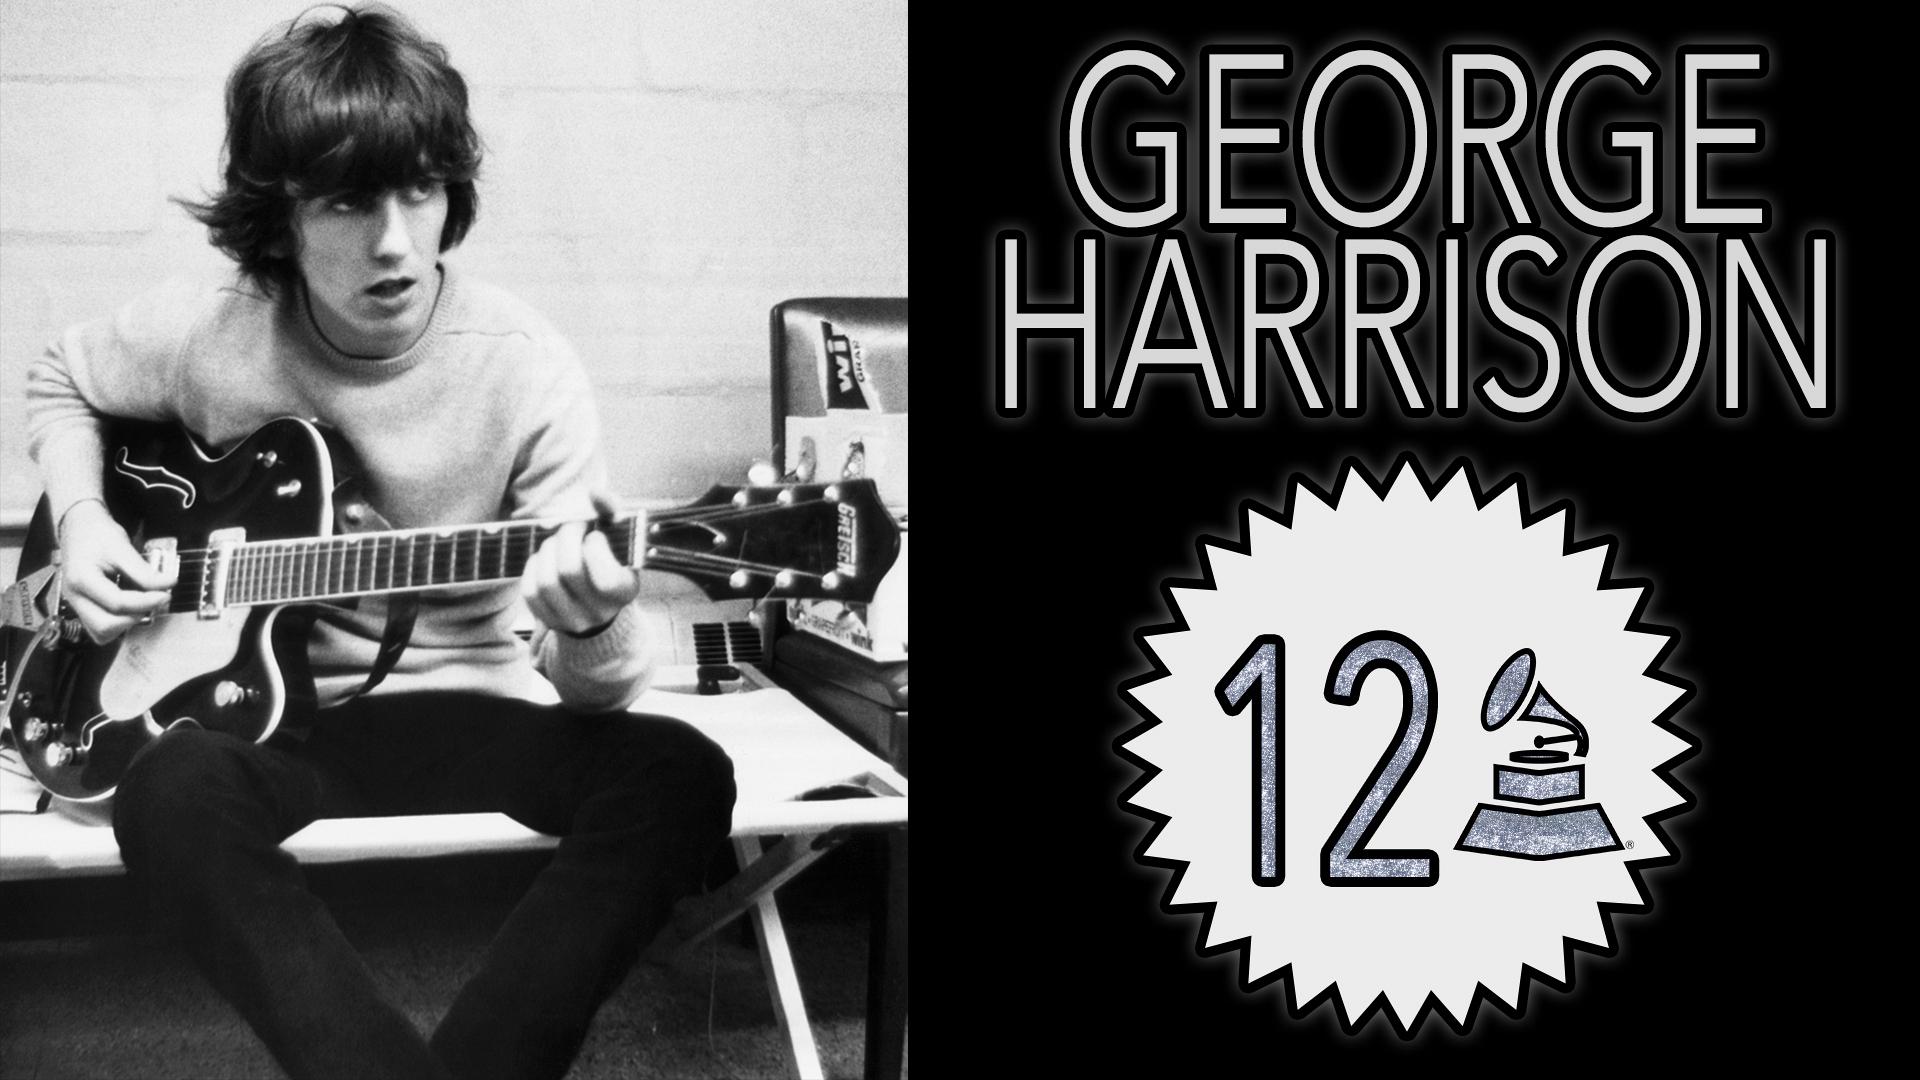 George Harrison with 12 GRAMMY Awards